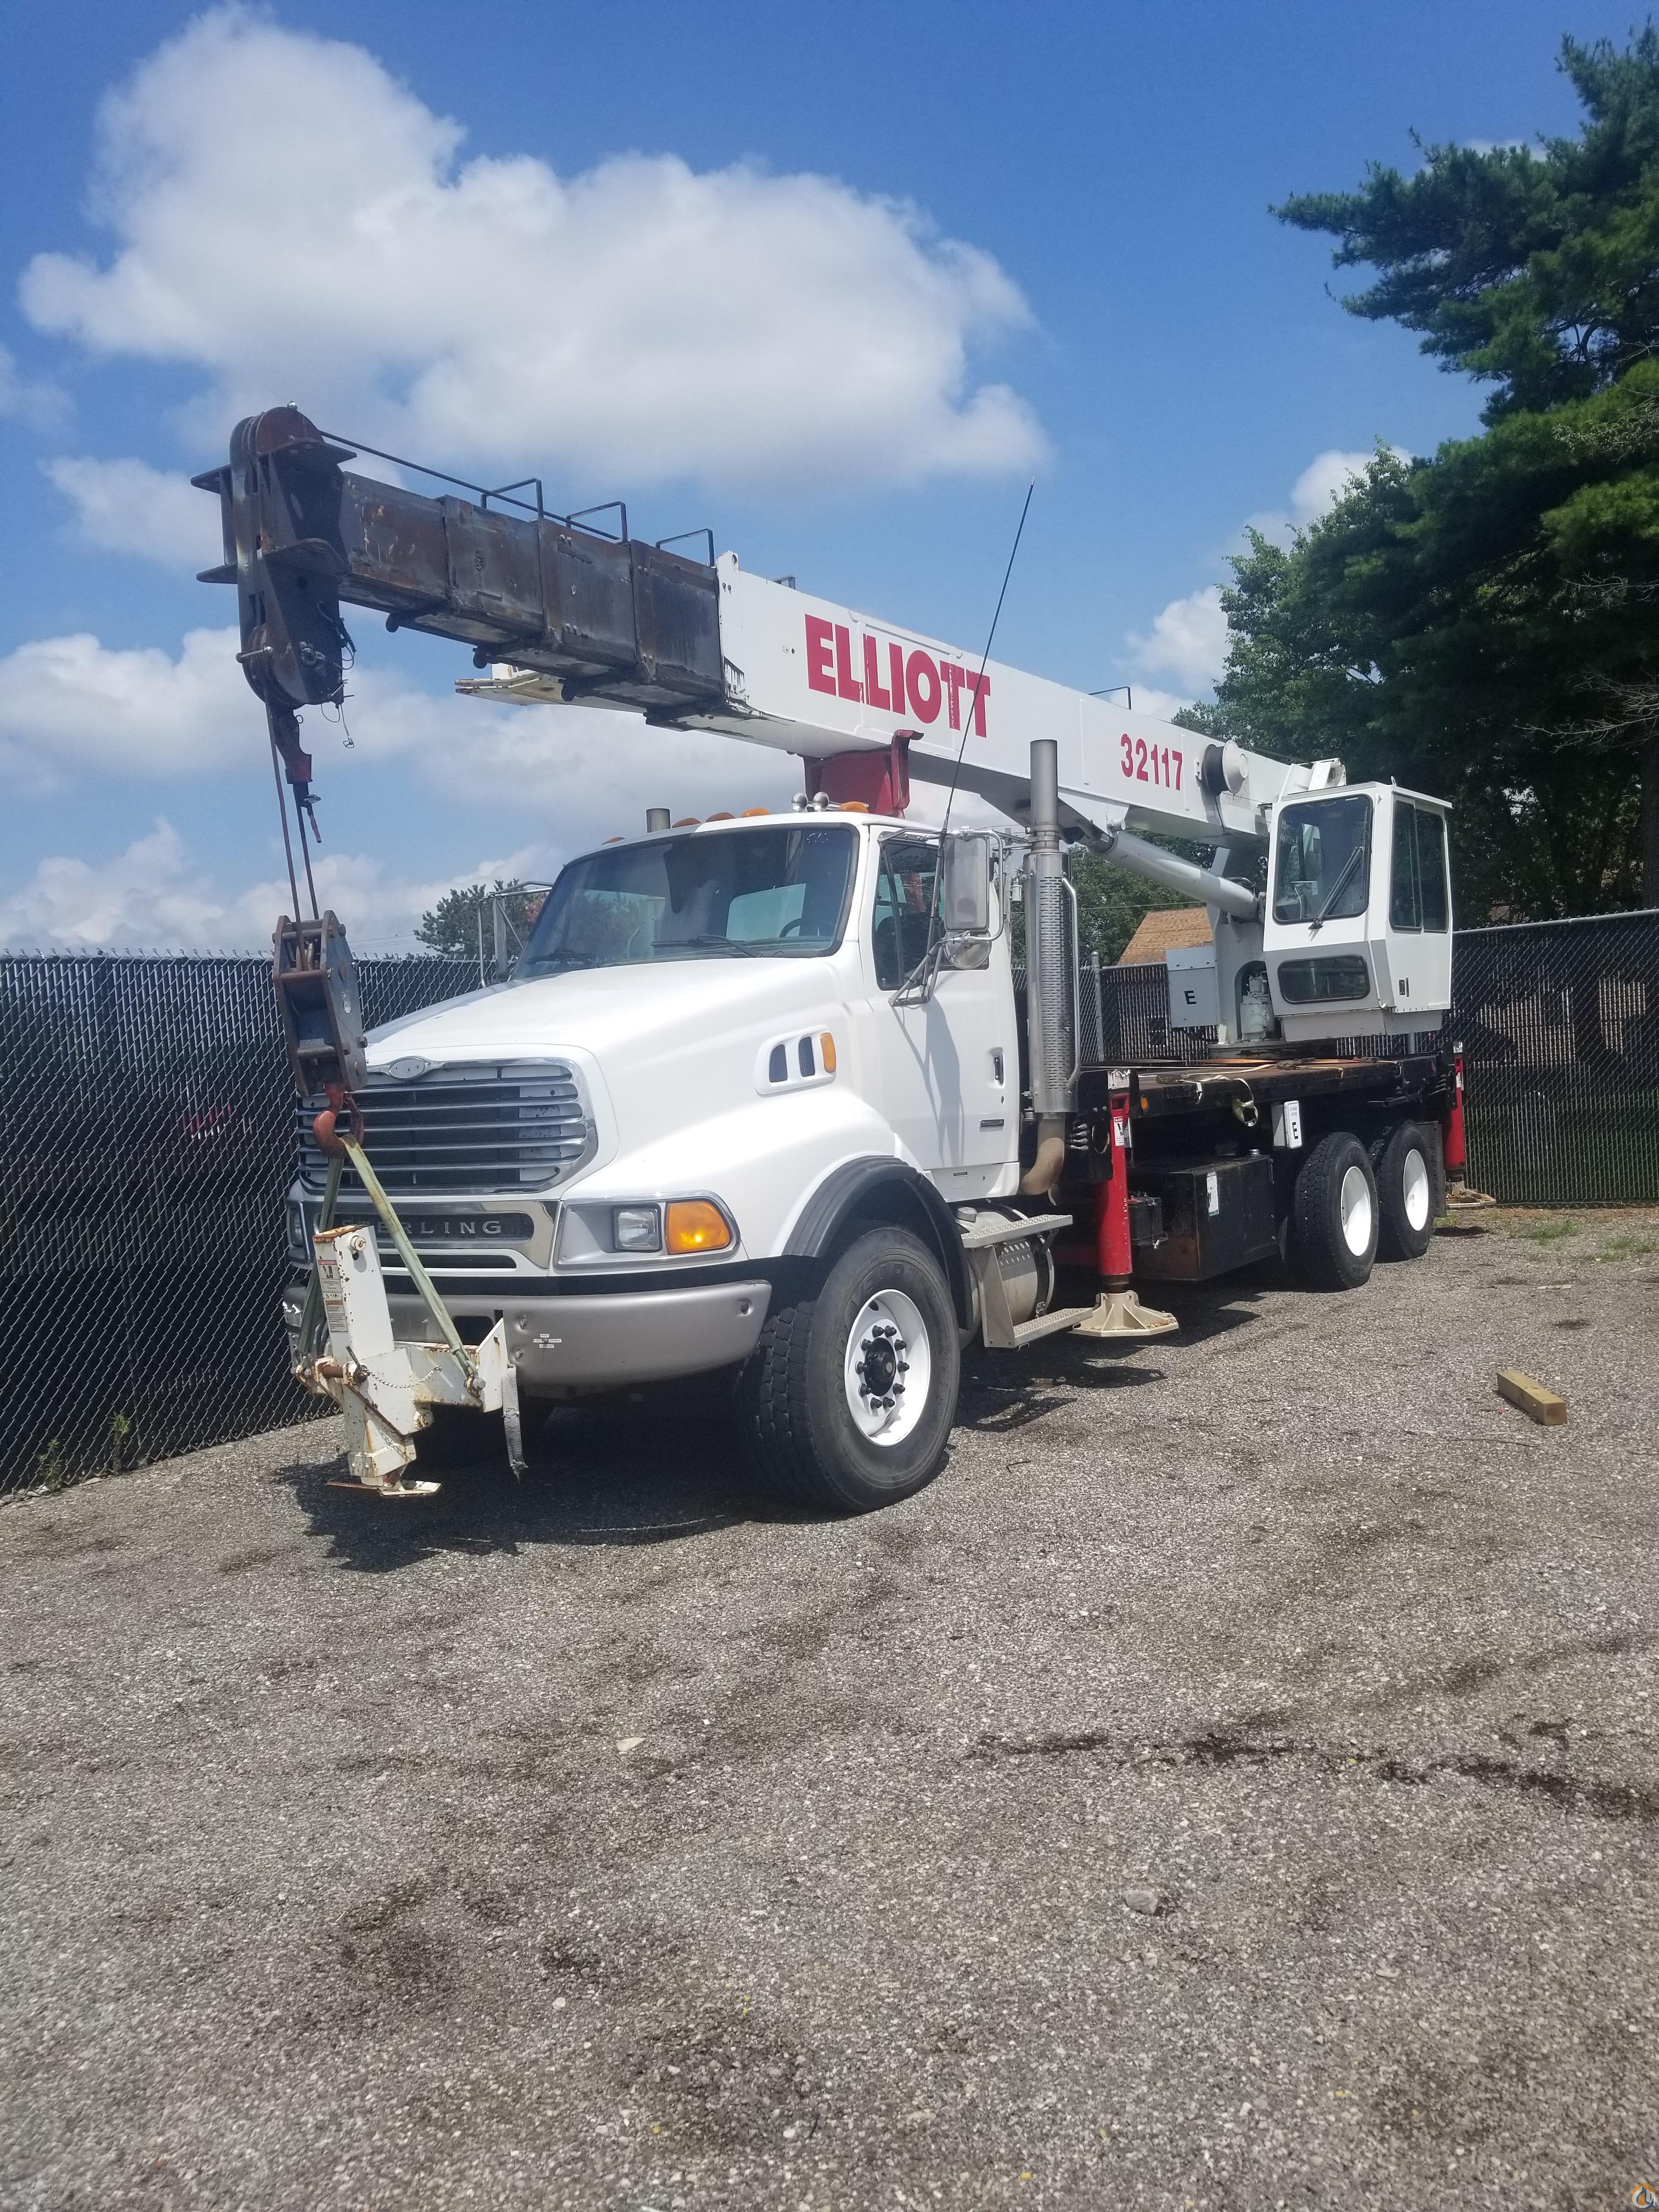 Elliott ECL3-55